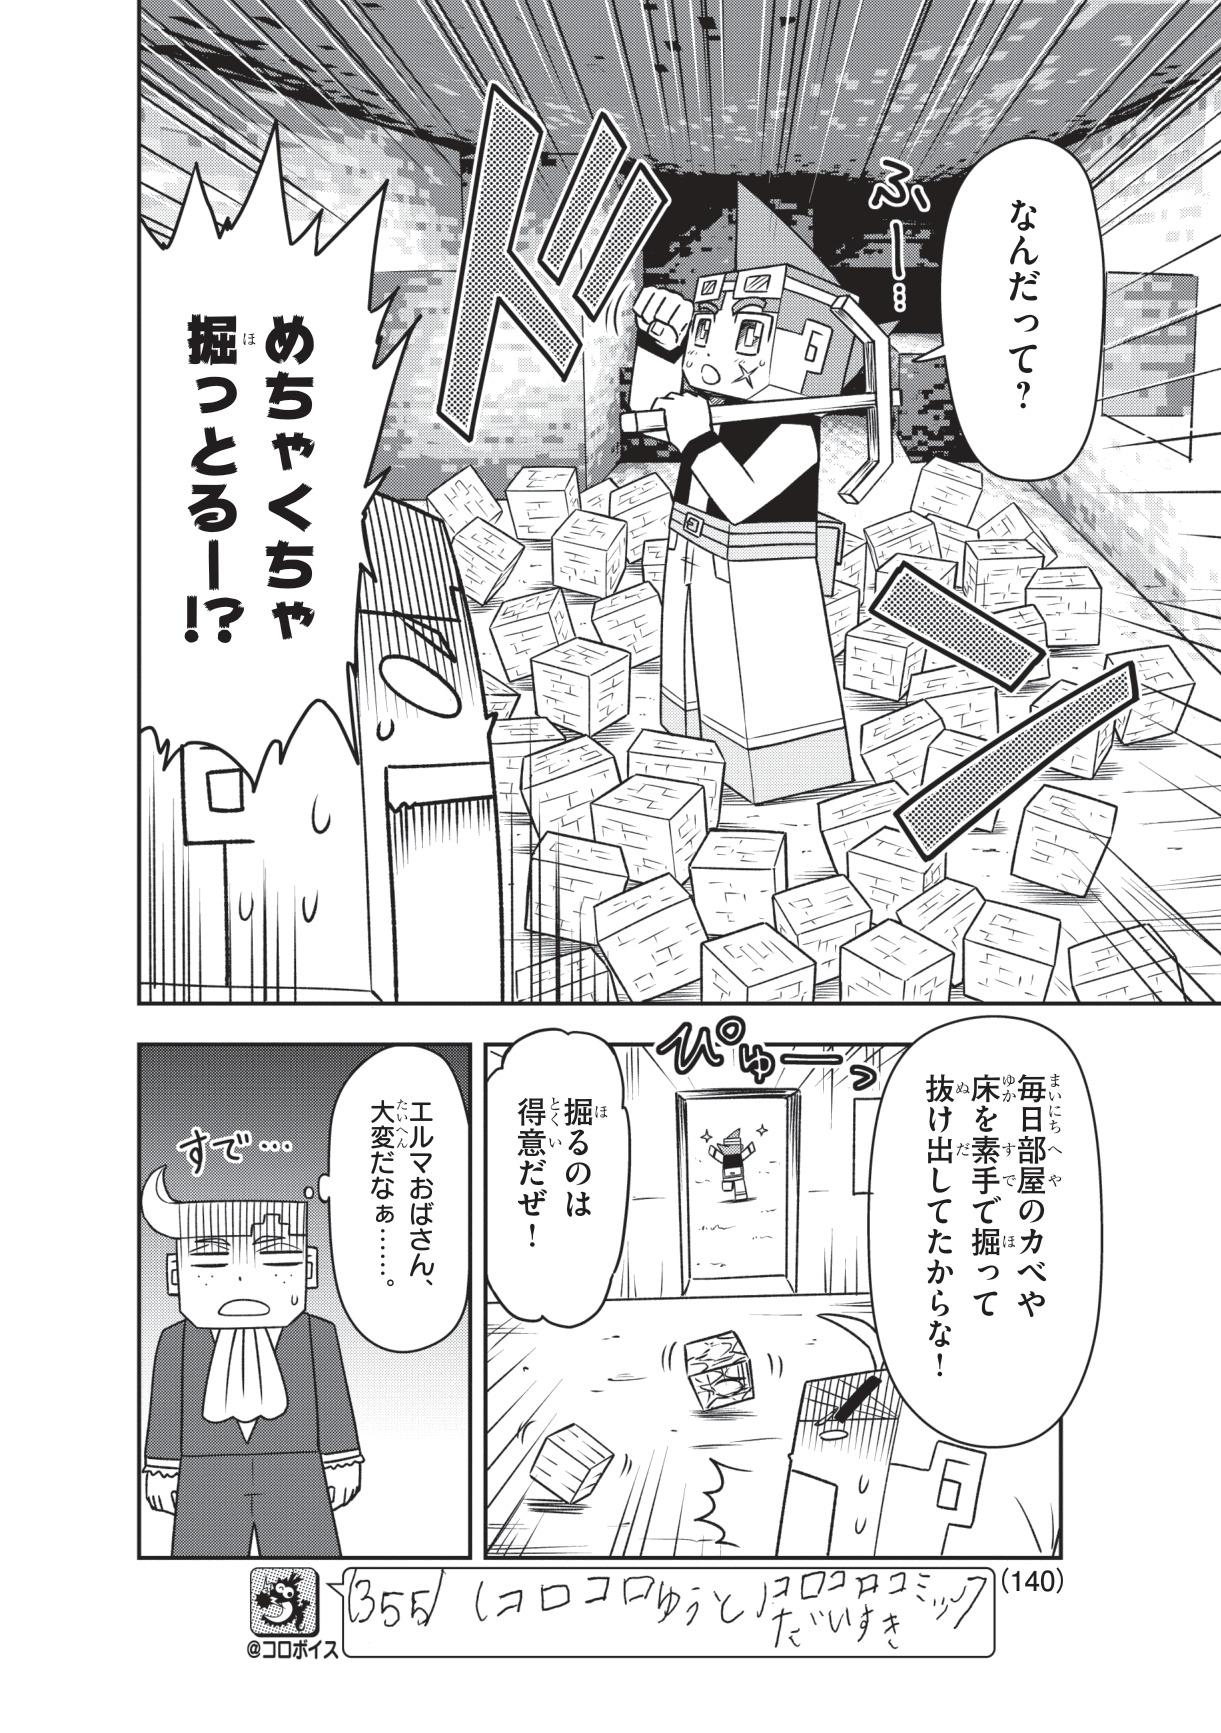 Minecraft Manga